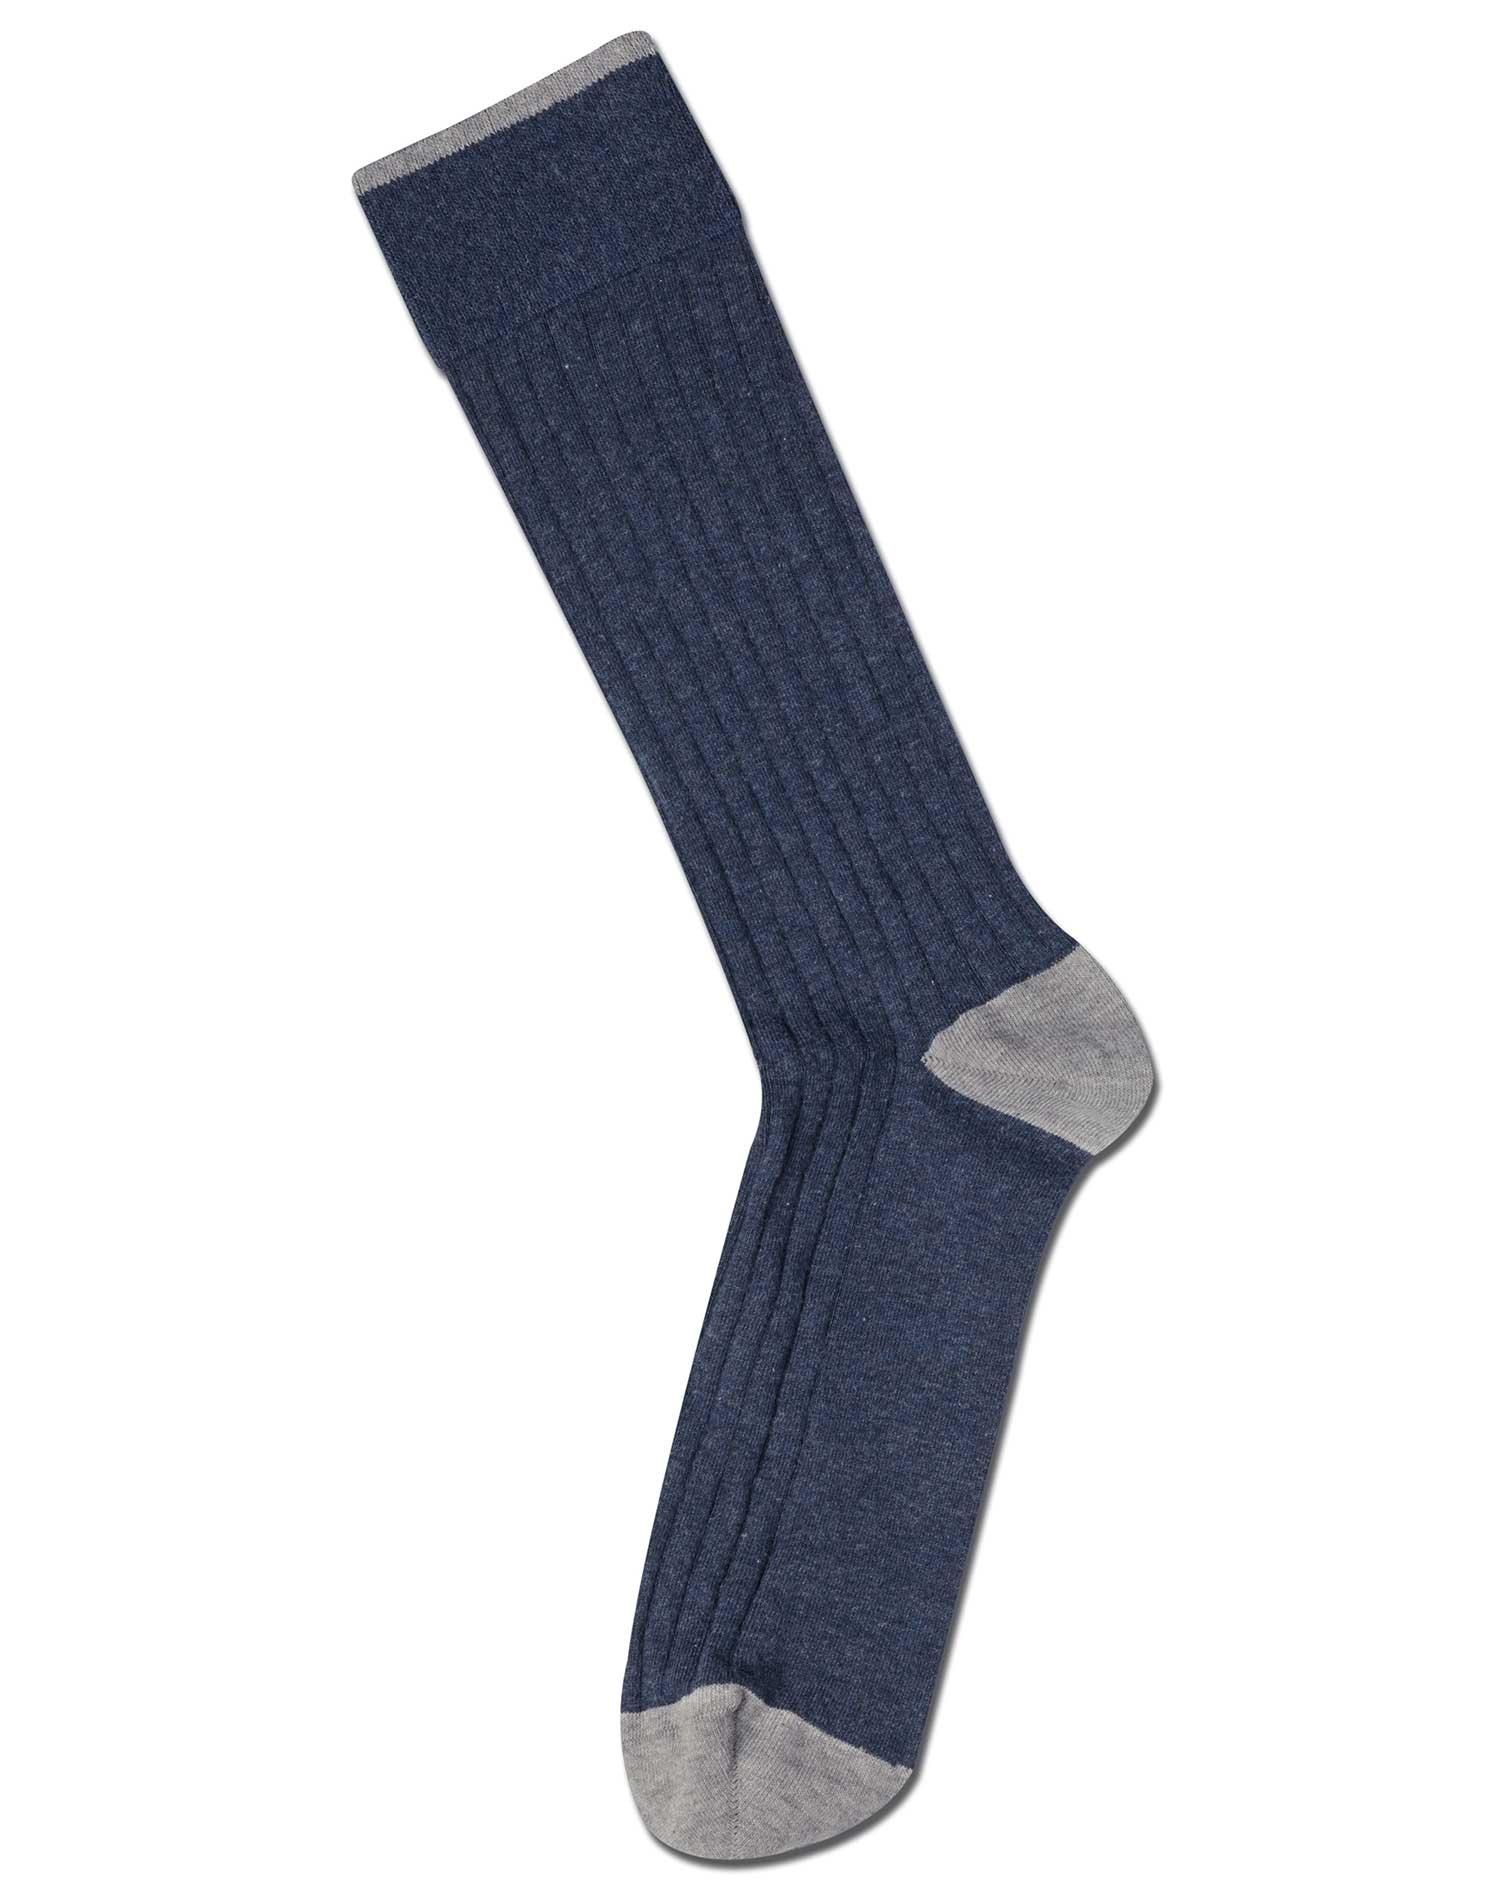 Indigo Blue Cotton Rib Socks Size Large by Charles Tyrwhitt